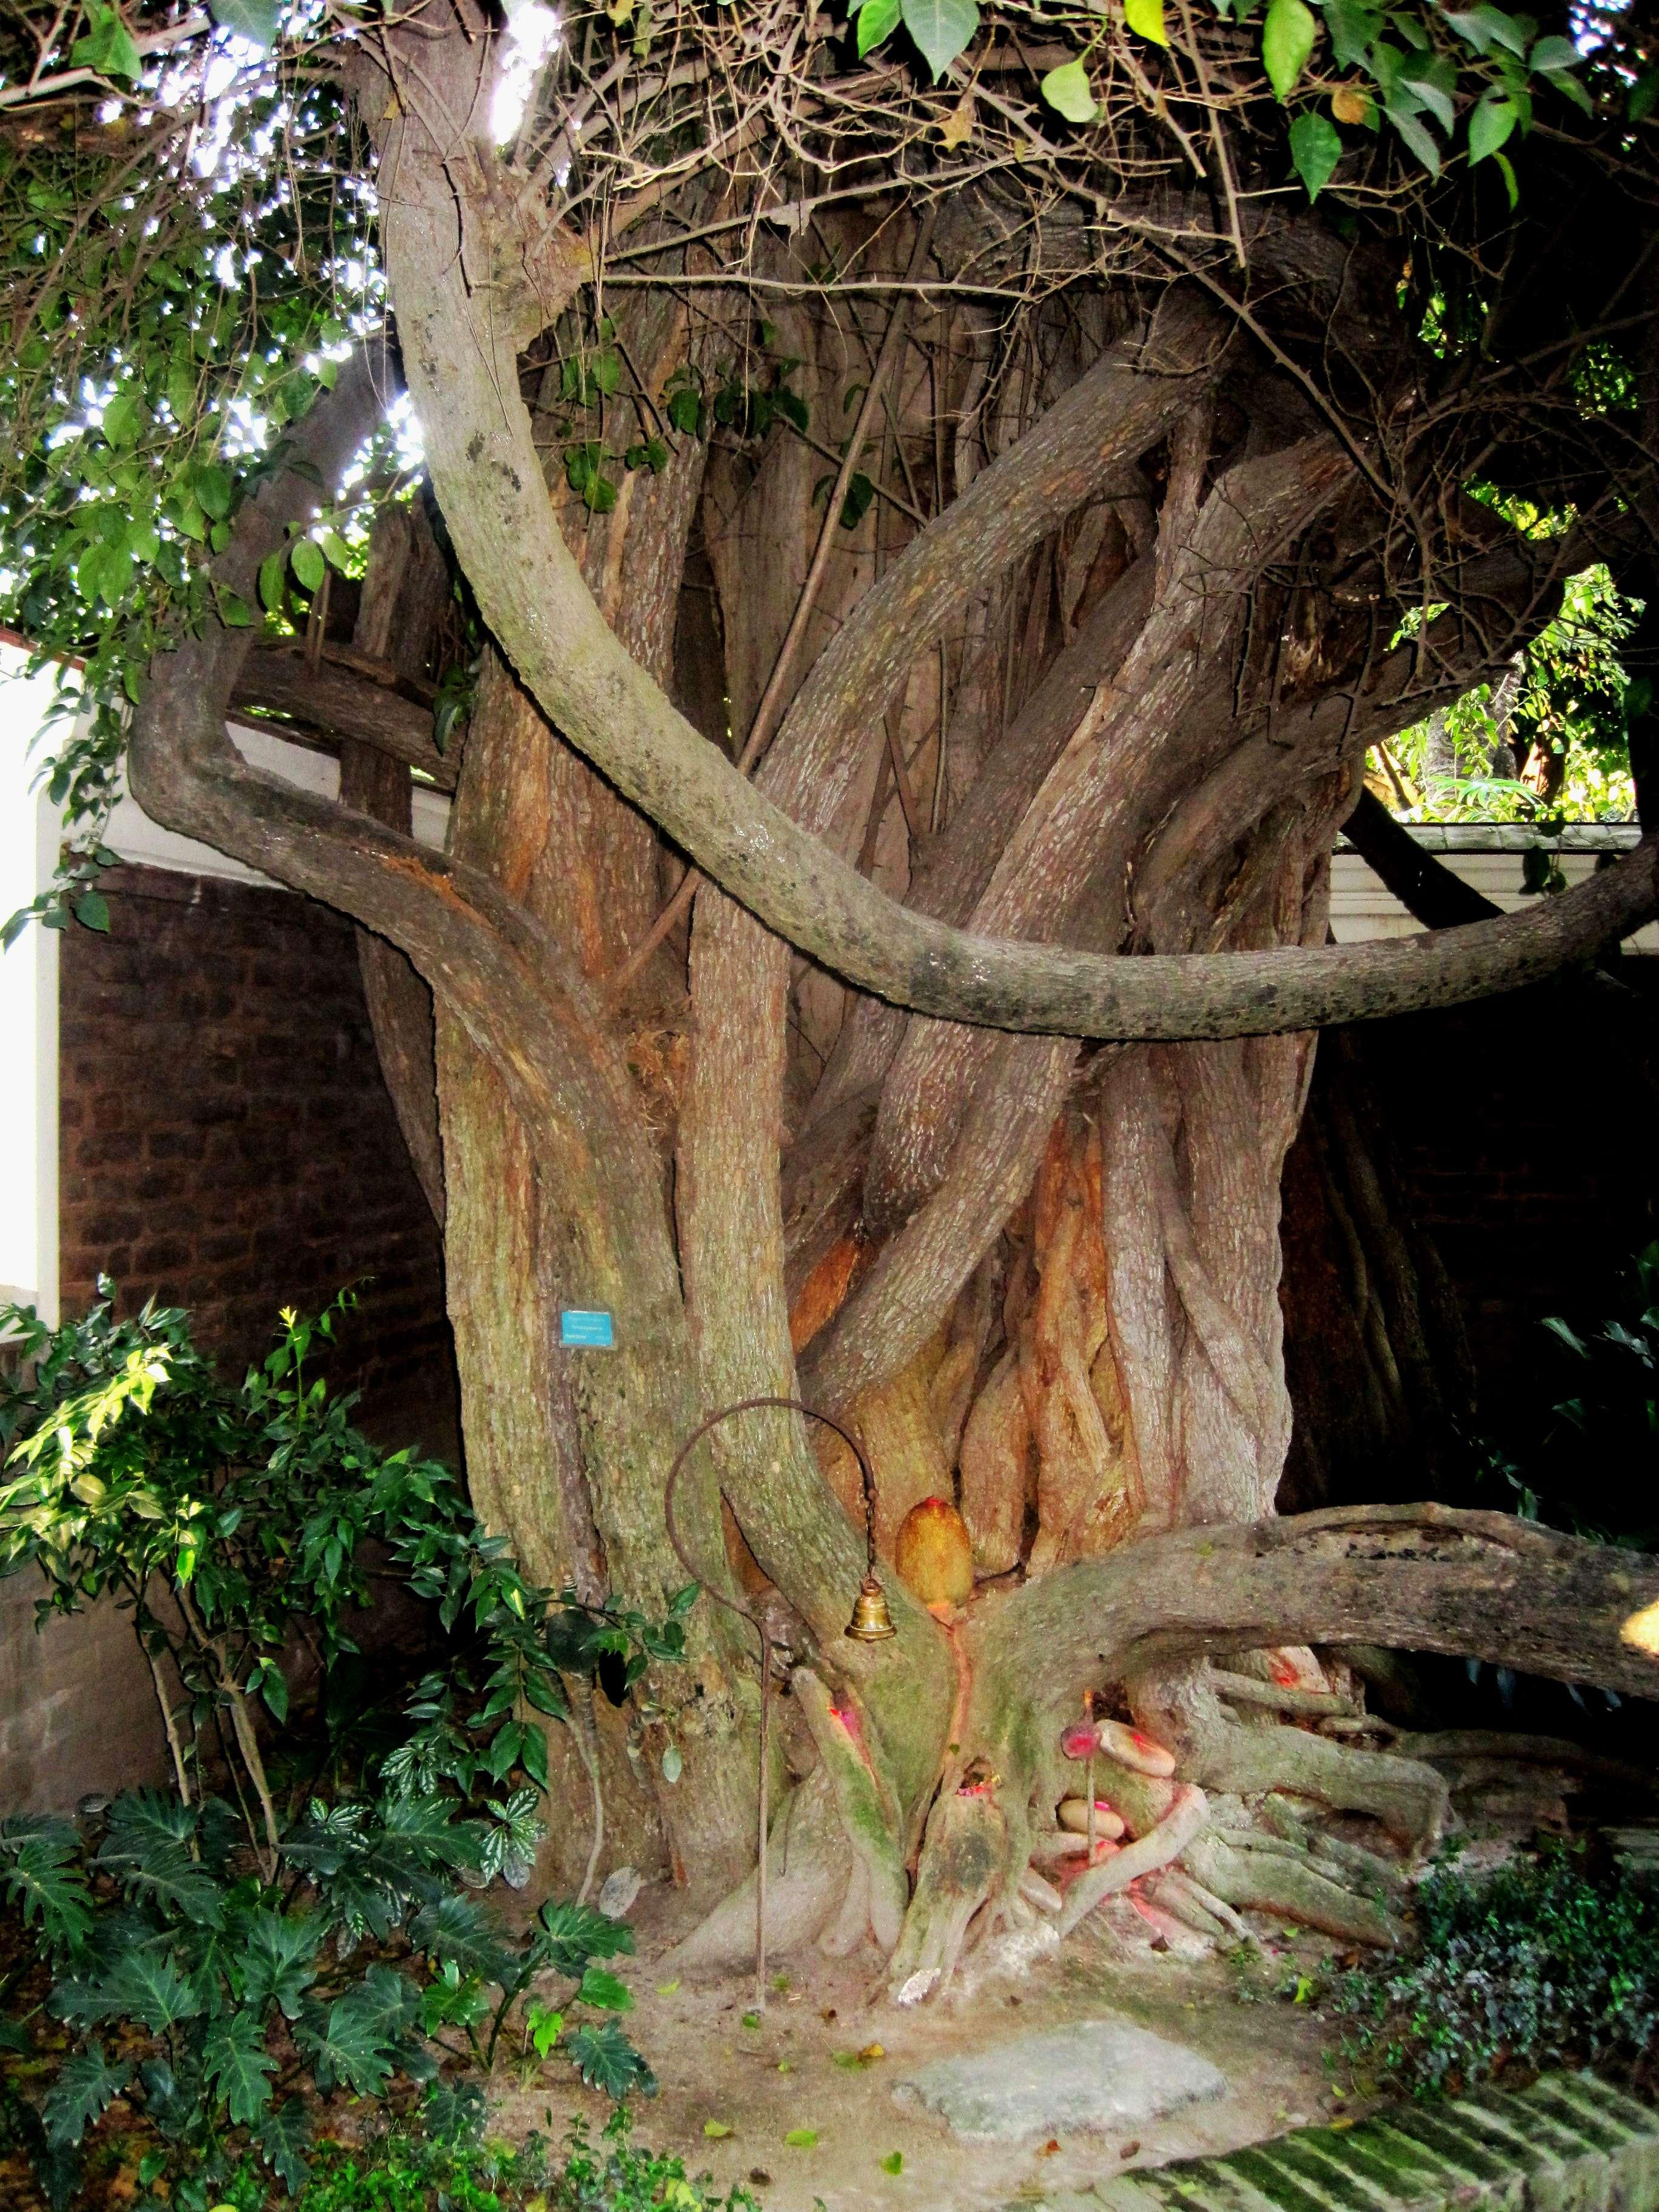 Kathmandu Garden of Dreams | Nepal Cultural Heritage Landmark.